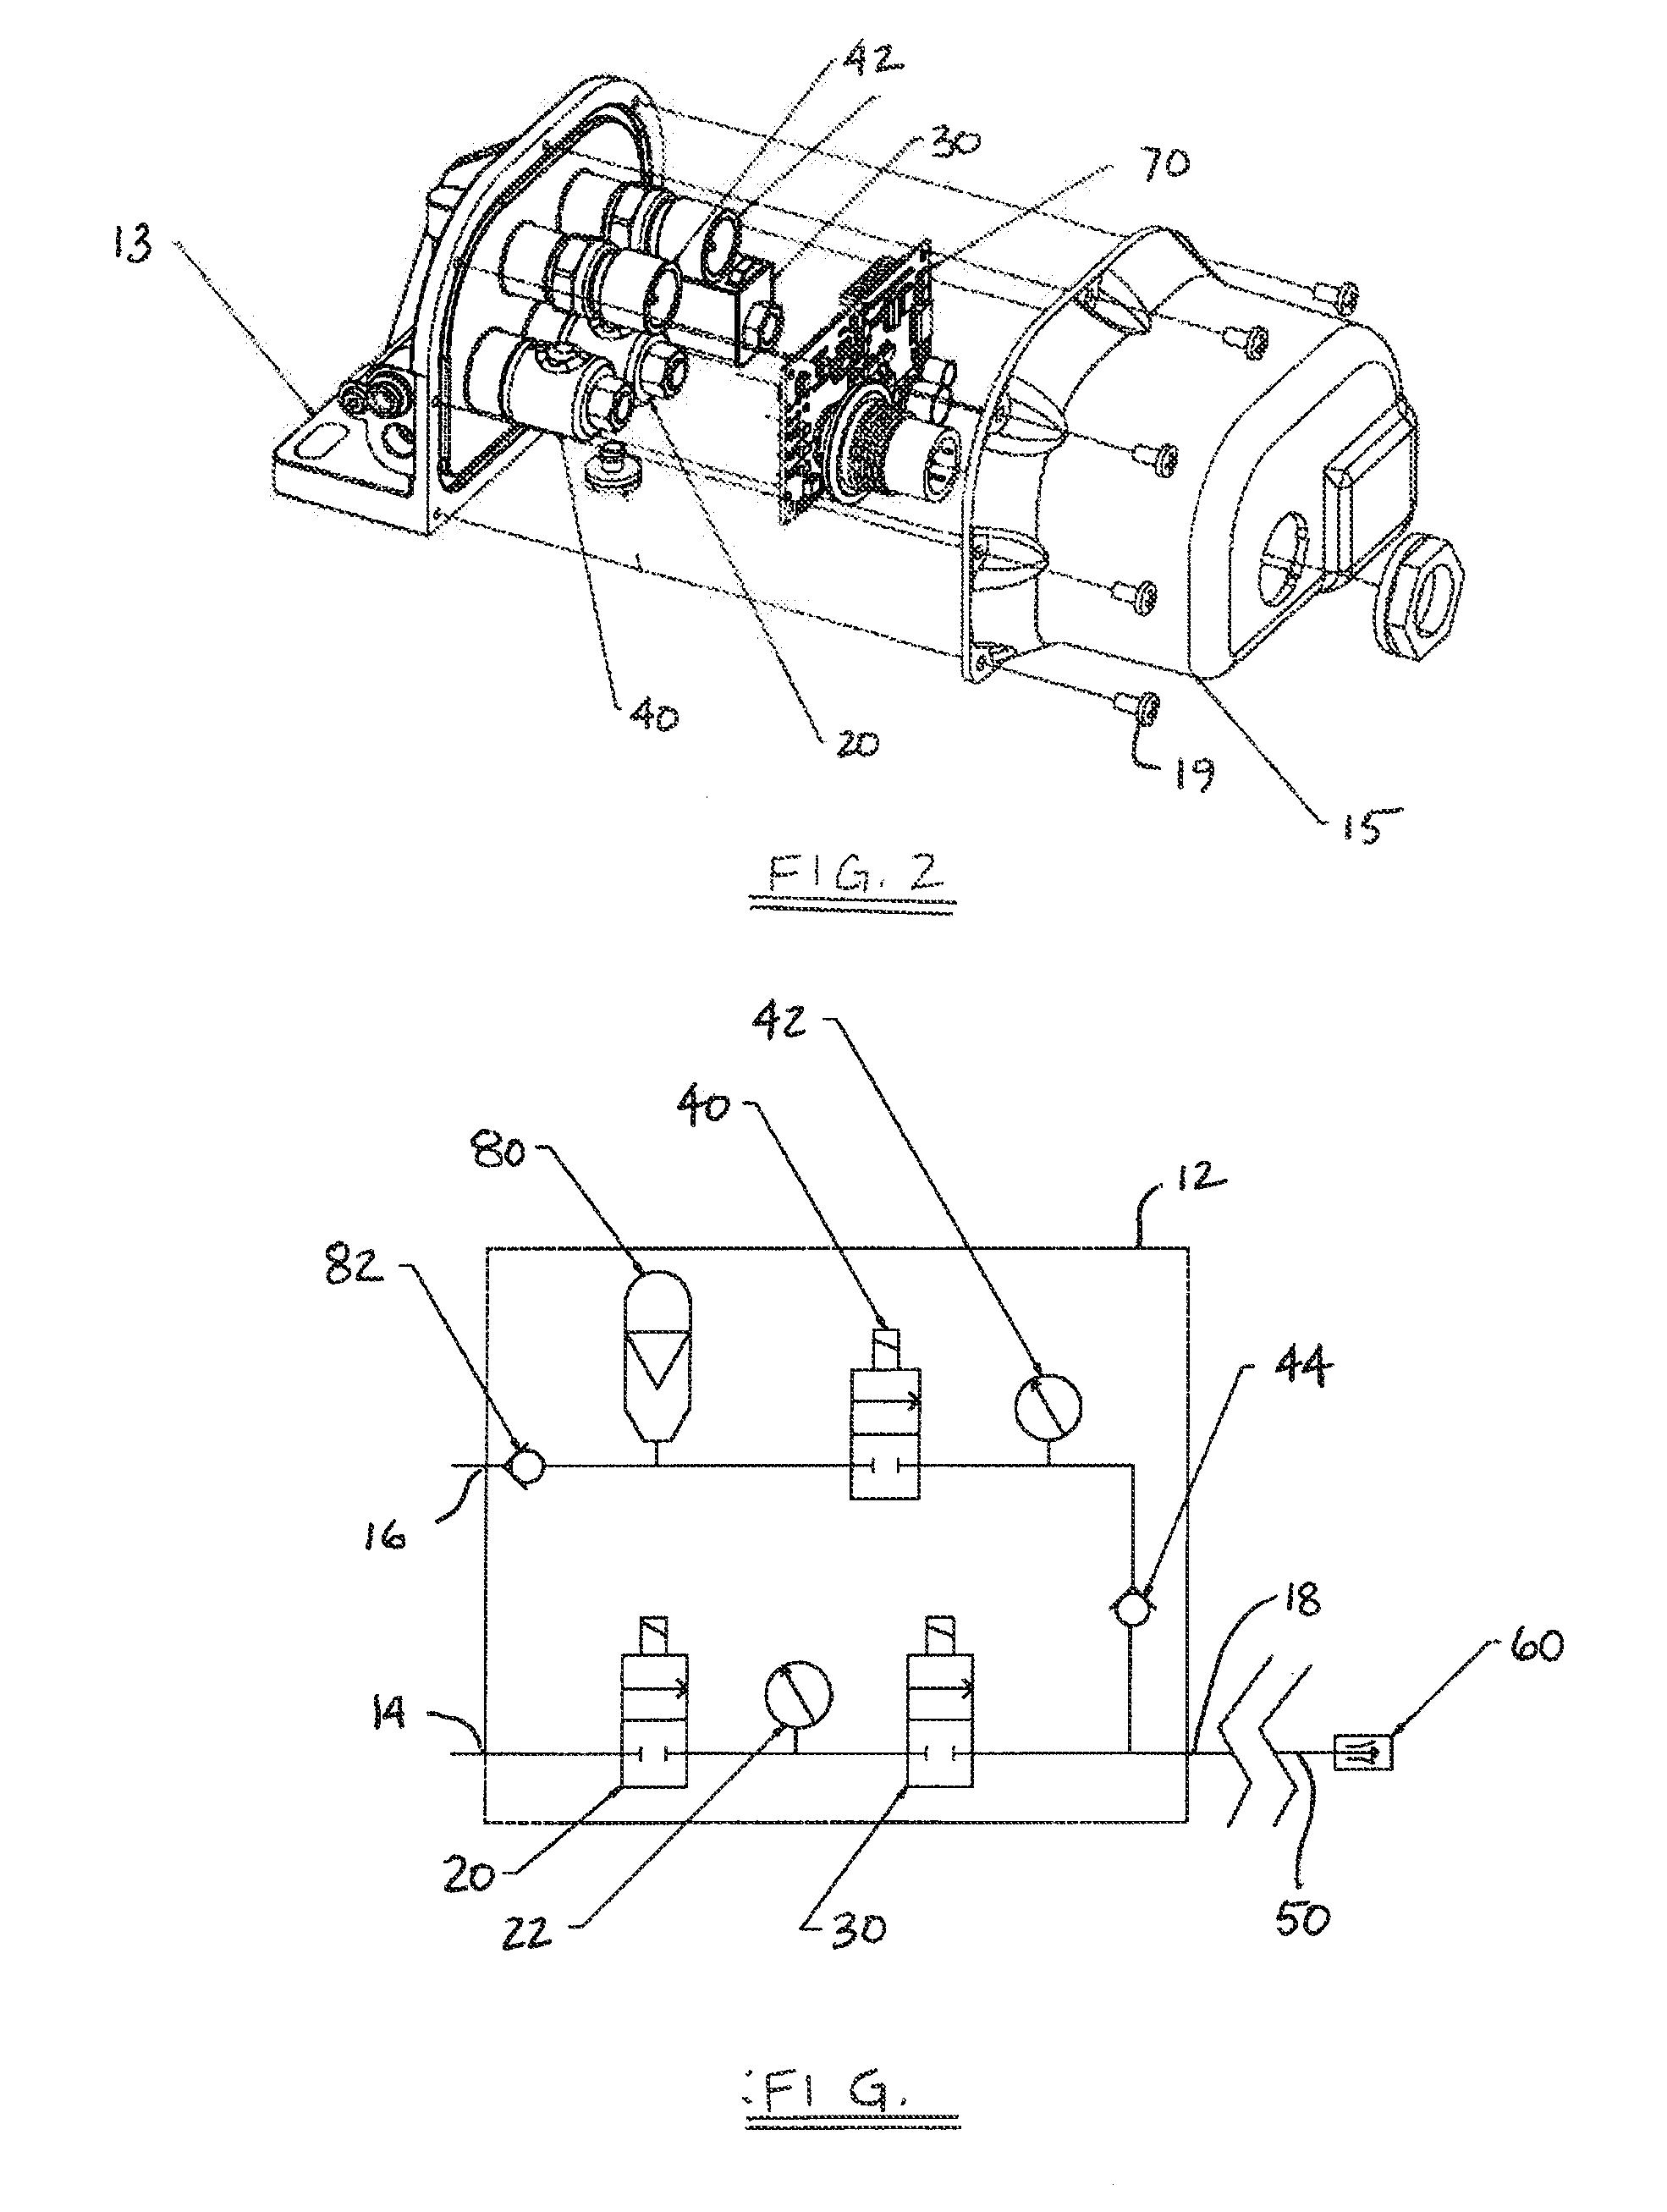 B18b1 Wiring Diagram